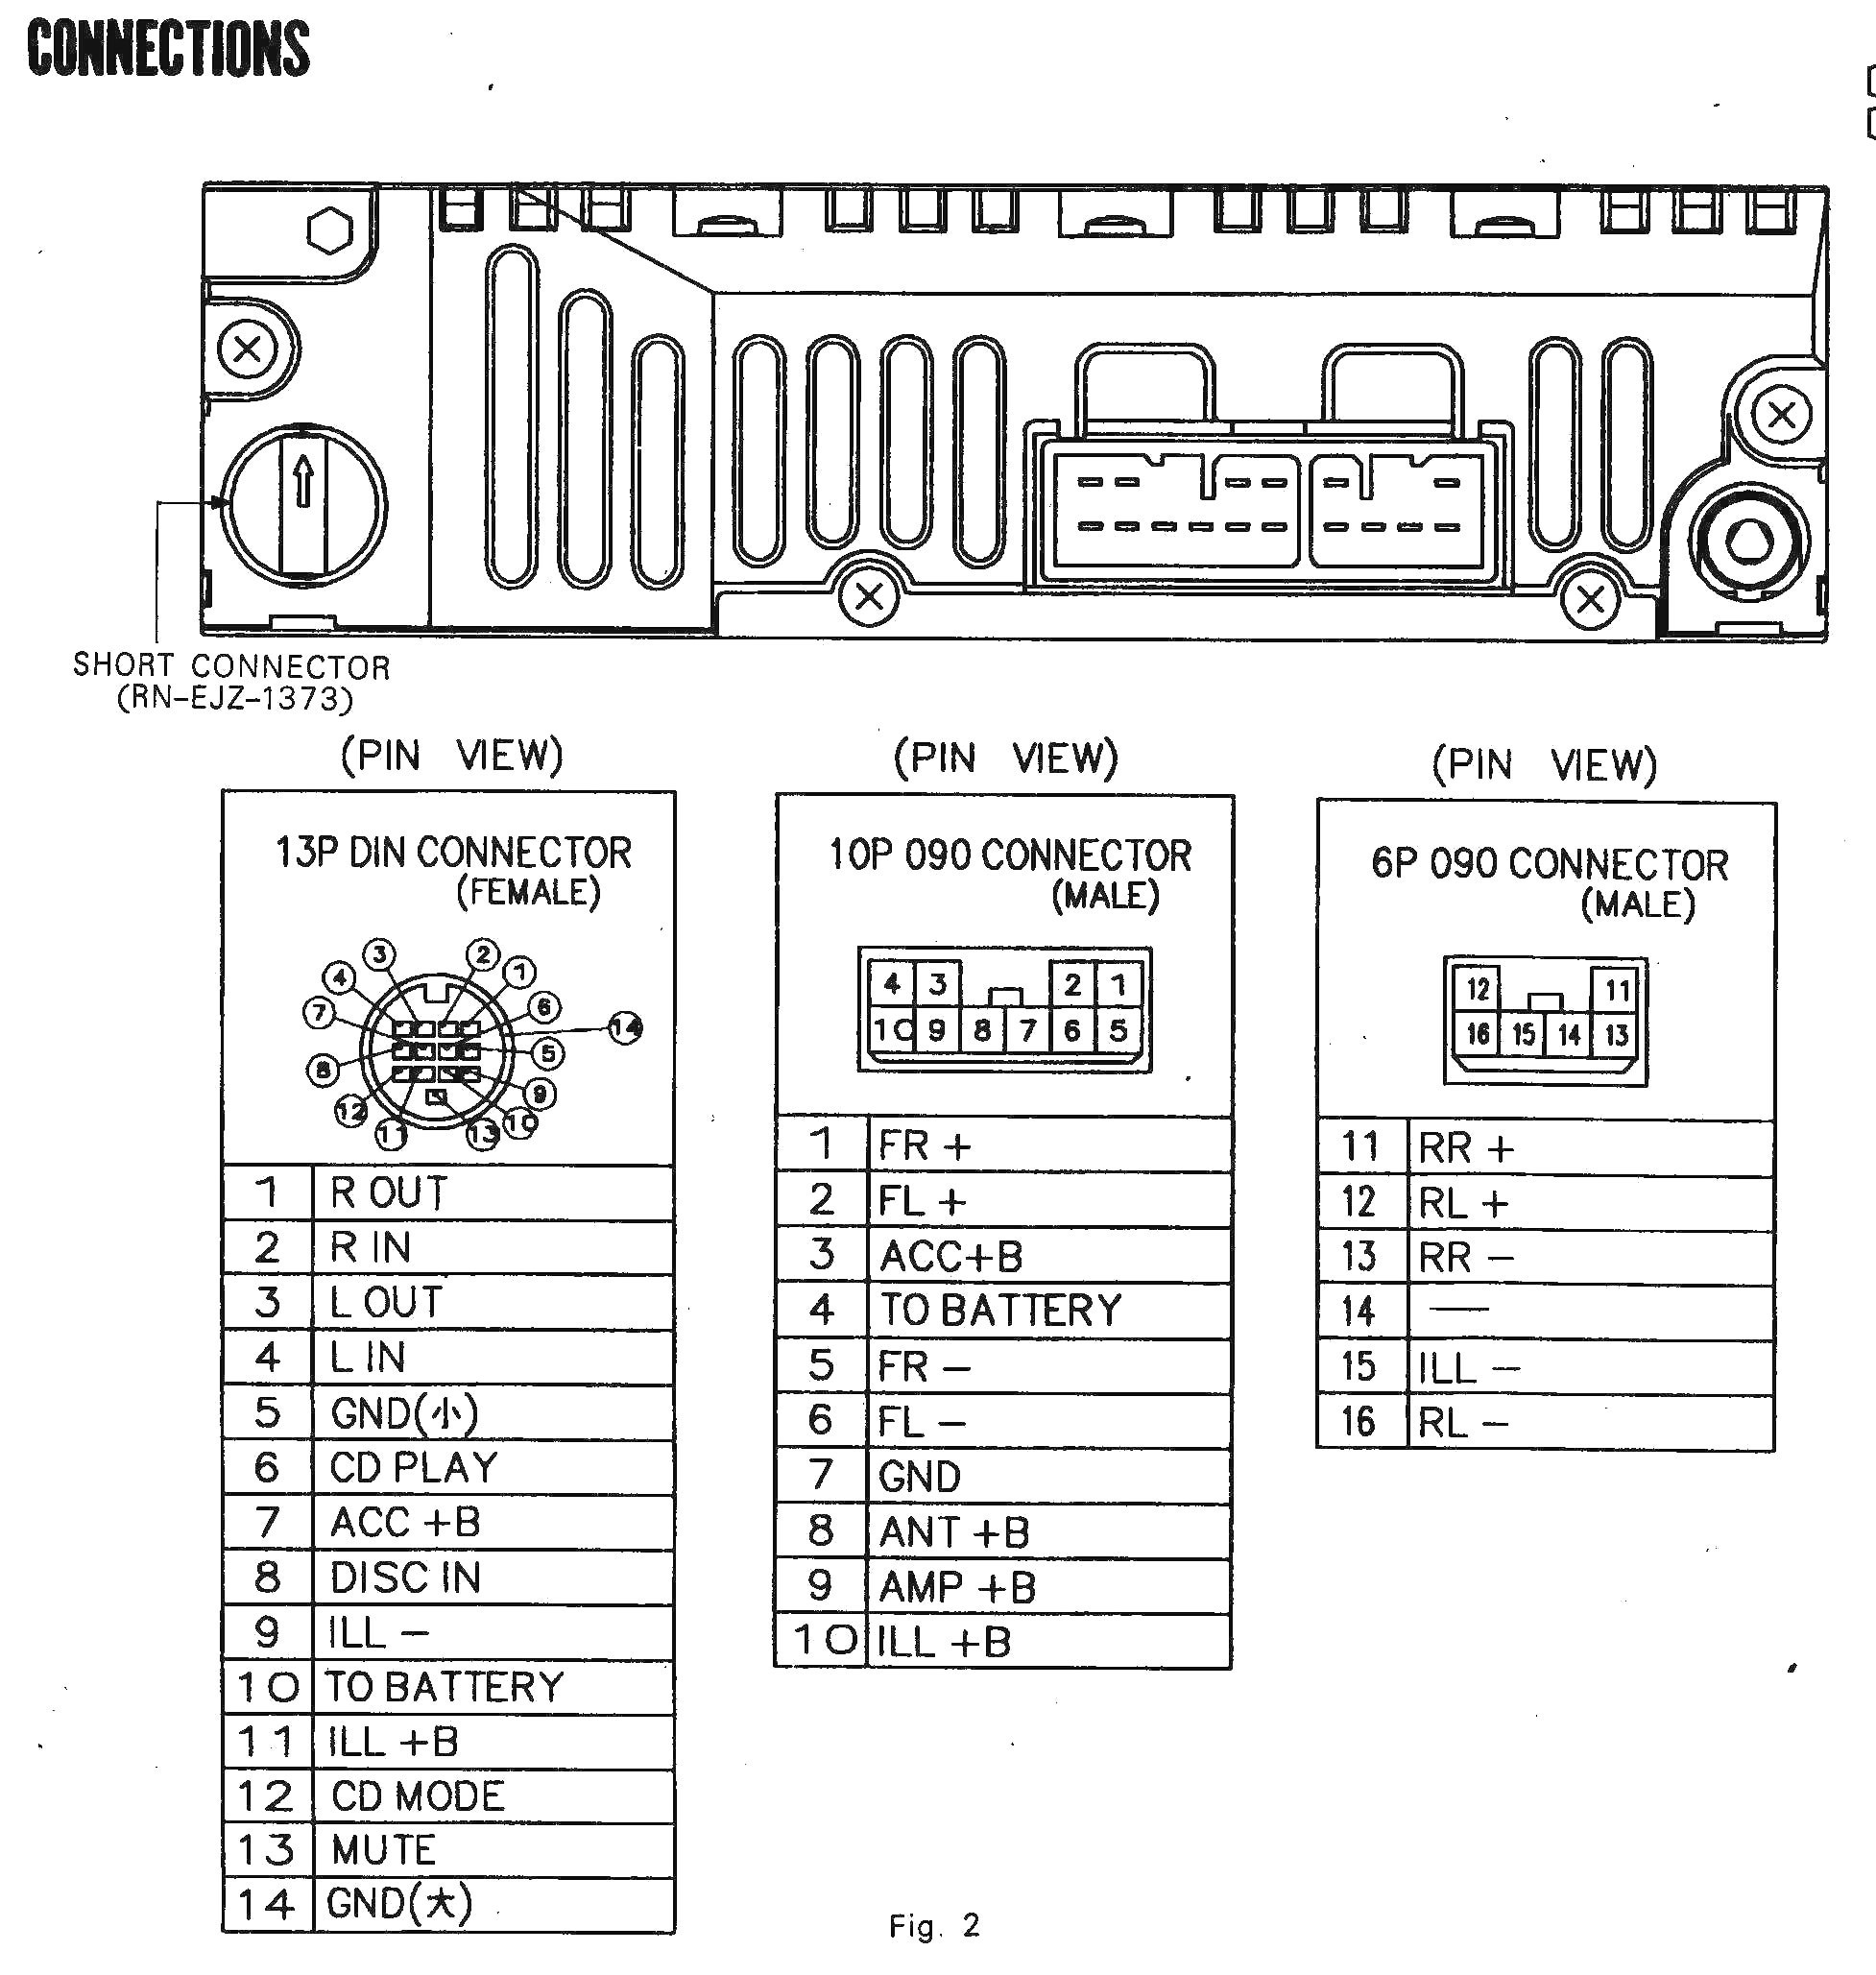 FT_8217] Avic D3 Wiring Schematic Pioneer Avic D3 Wiring Diagram Avic D3  WiringKweca Norab Gue45 Mohammedshrine Librar Wiring 101